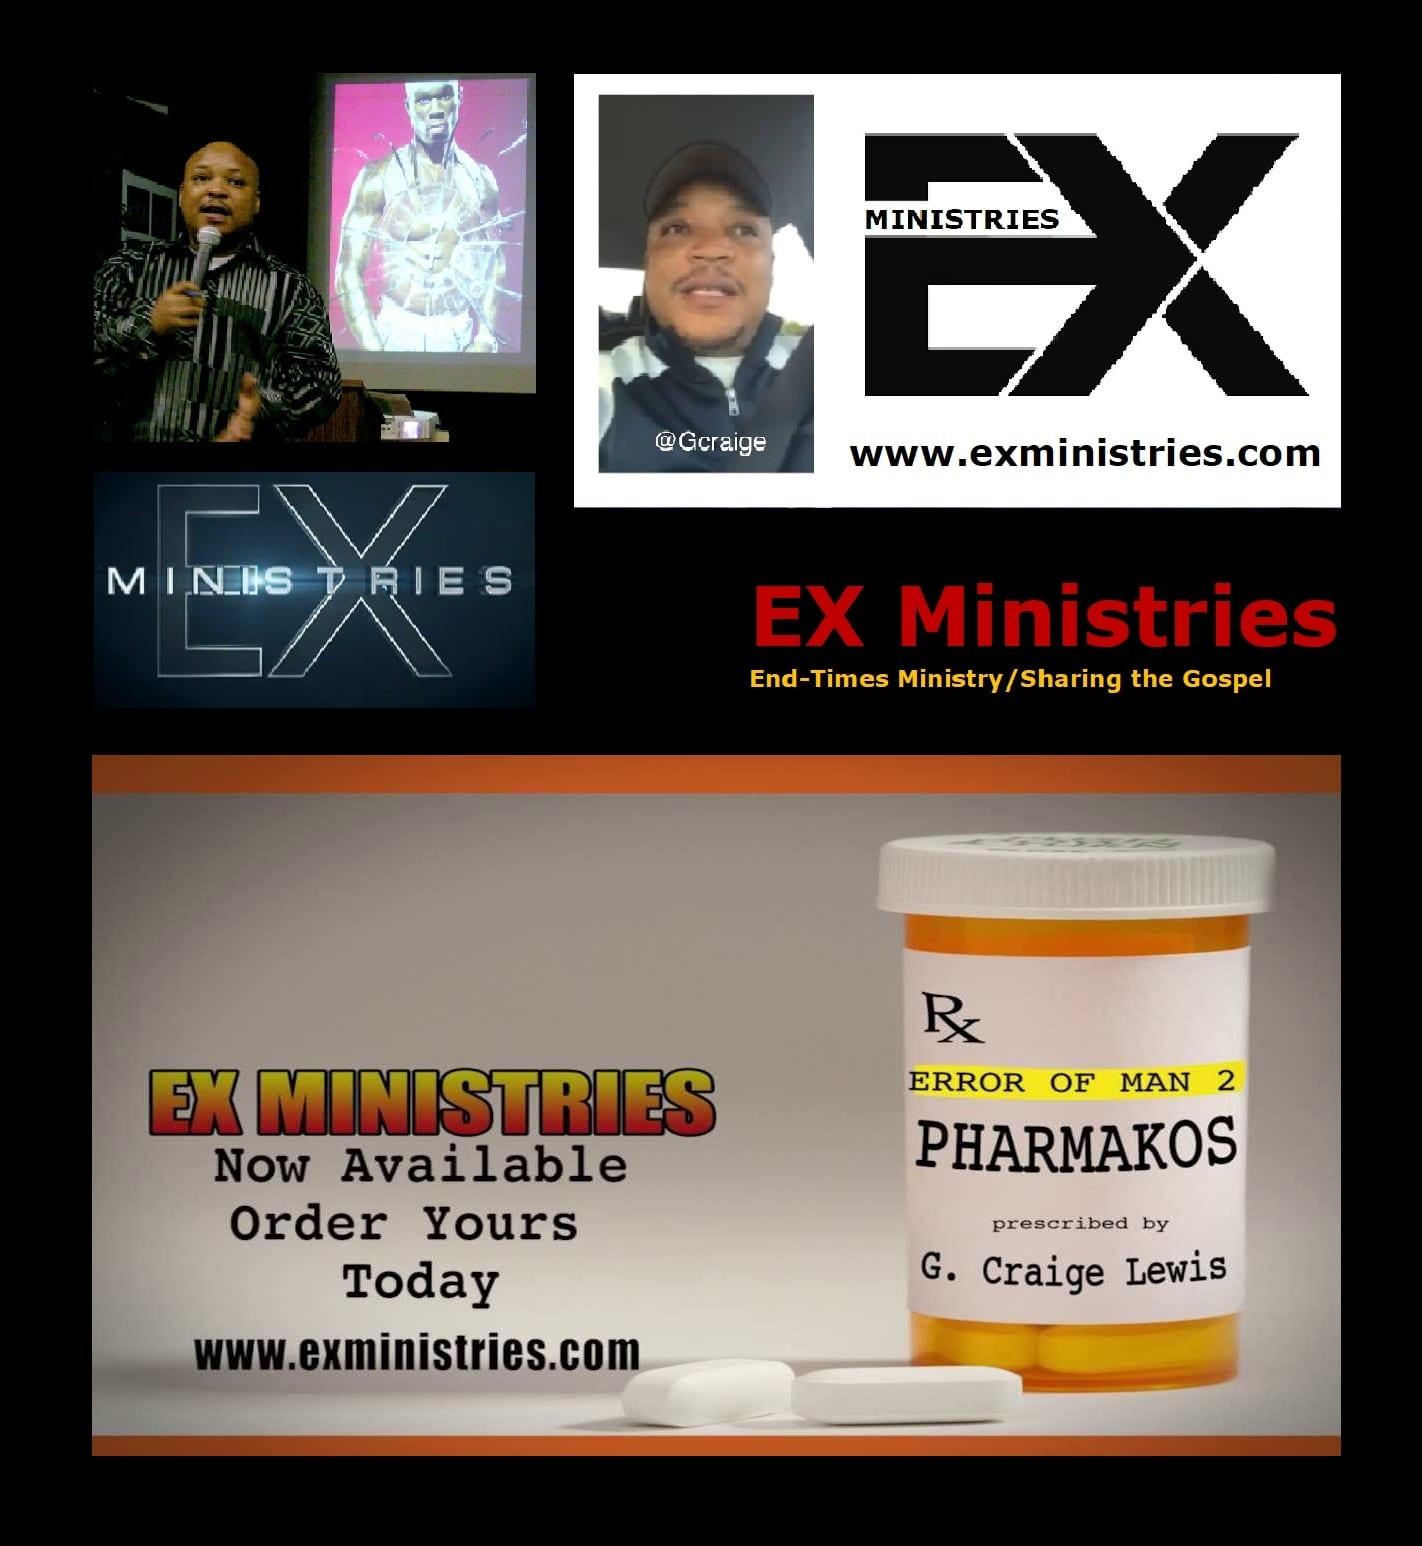 EX Ministries Health